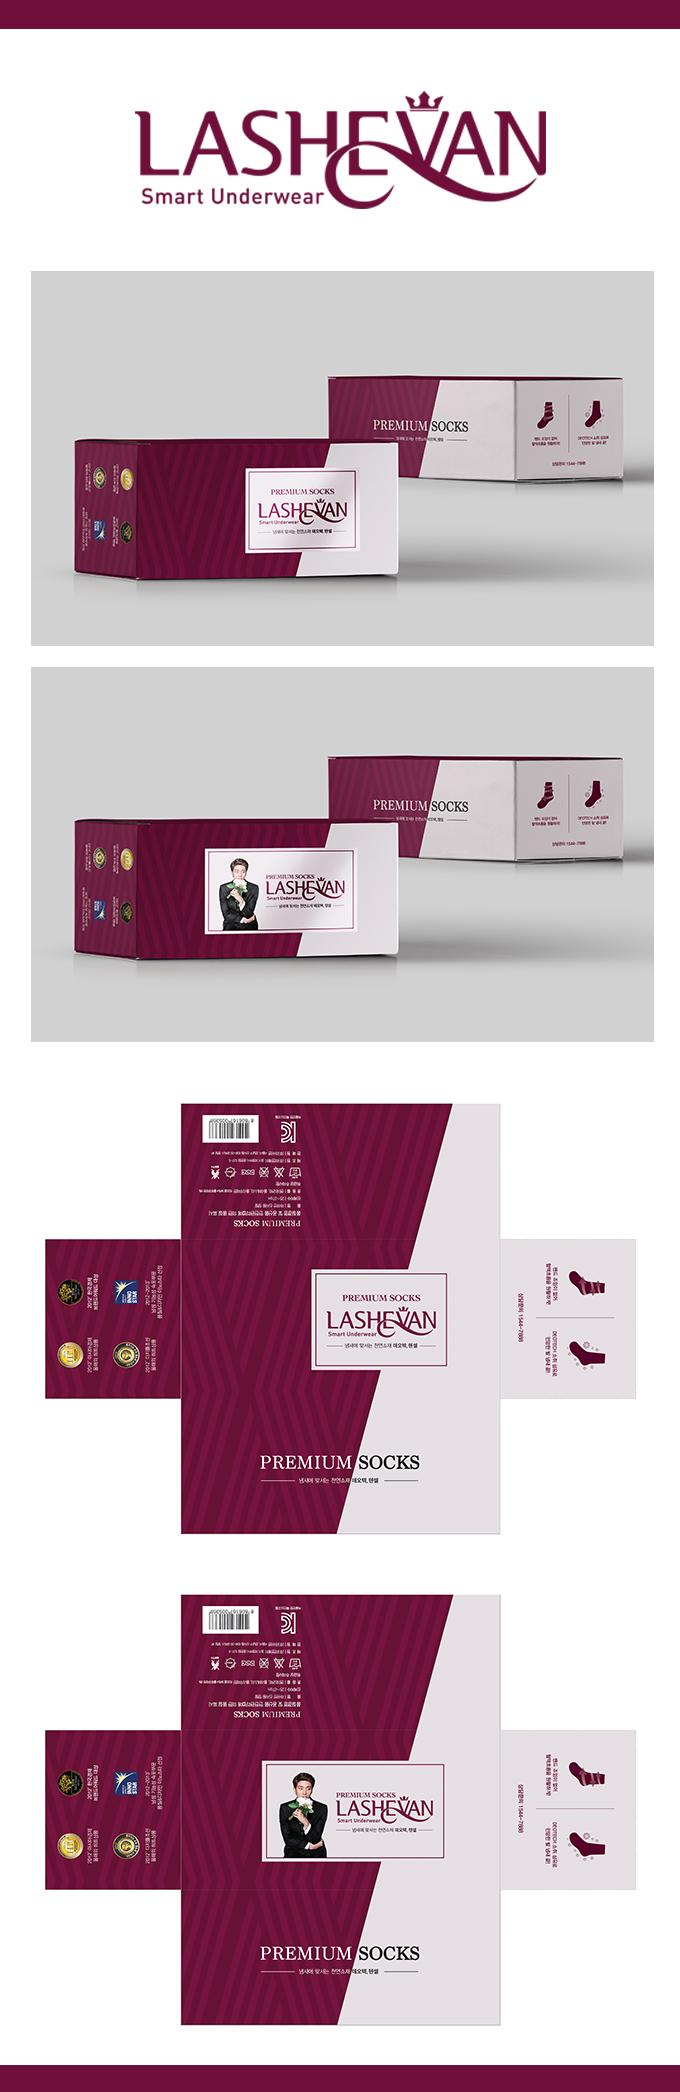 LASHEVAN_s3